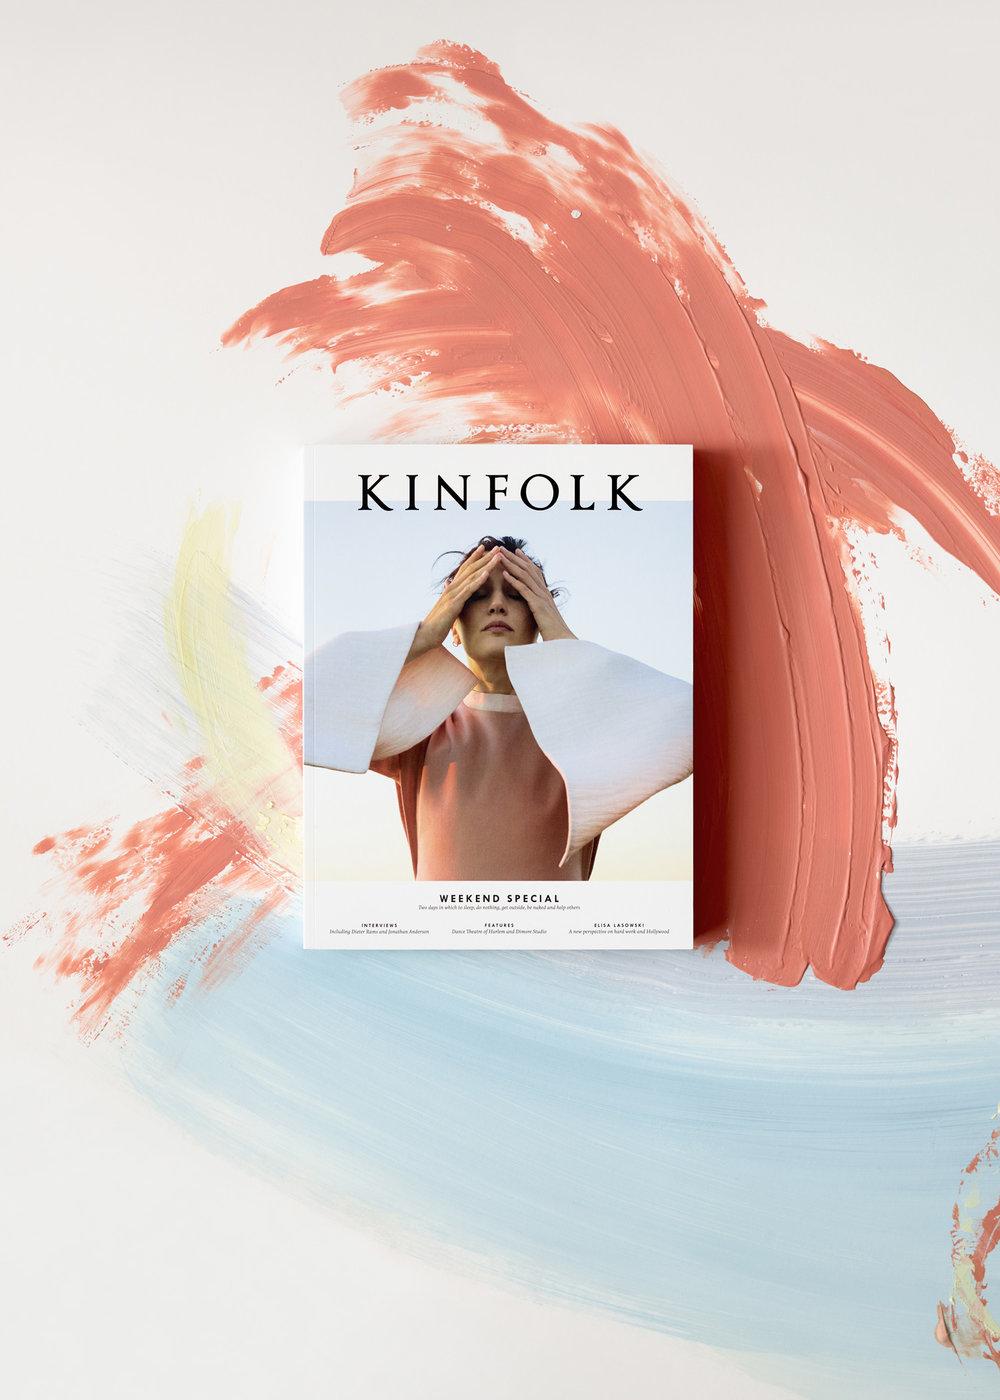 KinfolkPromo_ArtDirection01.jpg